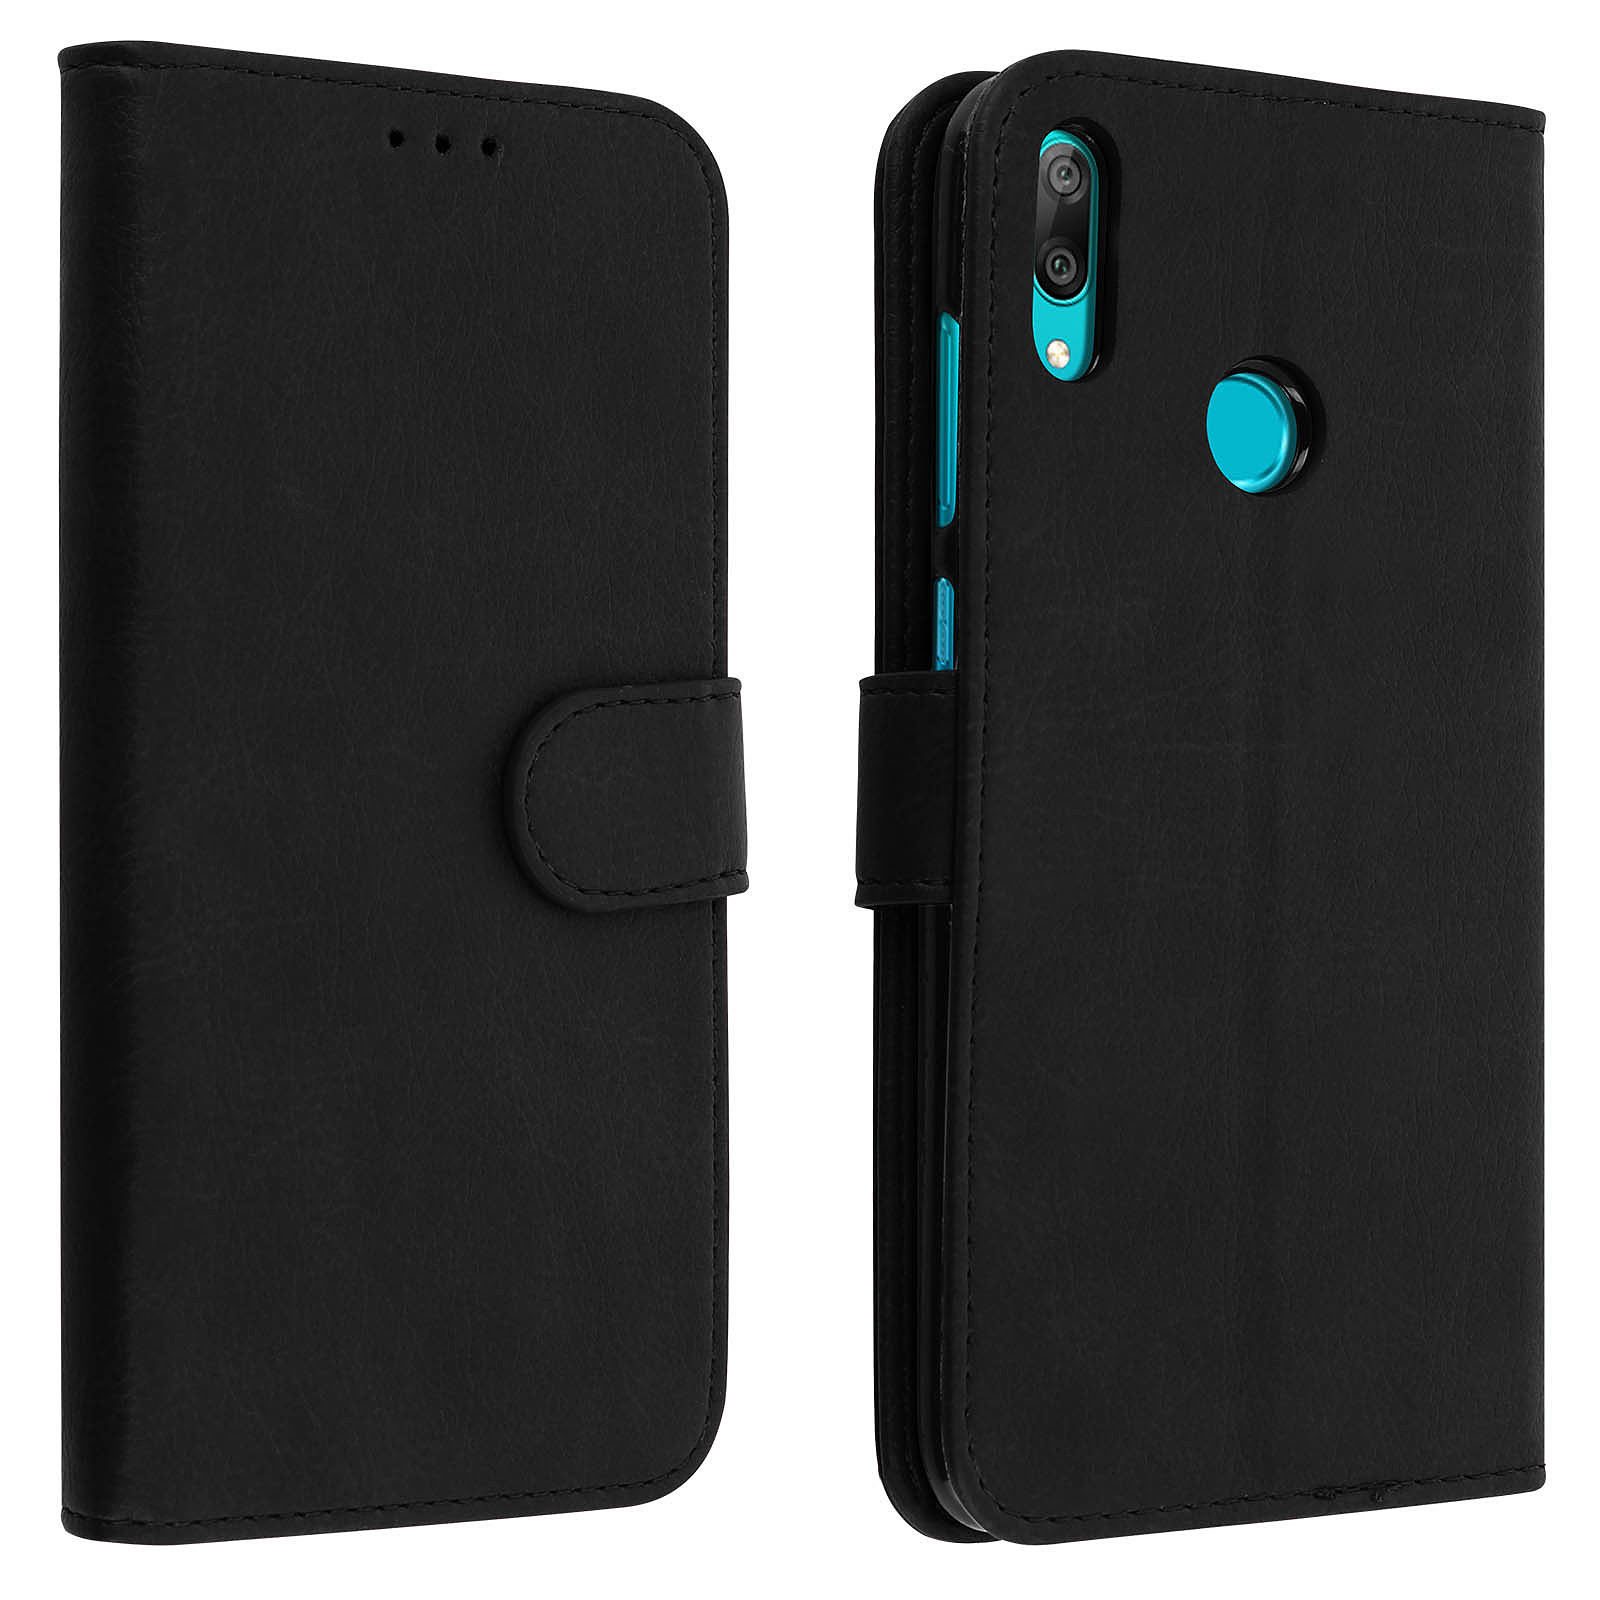 Avizar Etui folio Noir pour Huawei Y7 2019